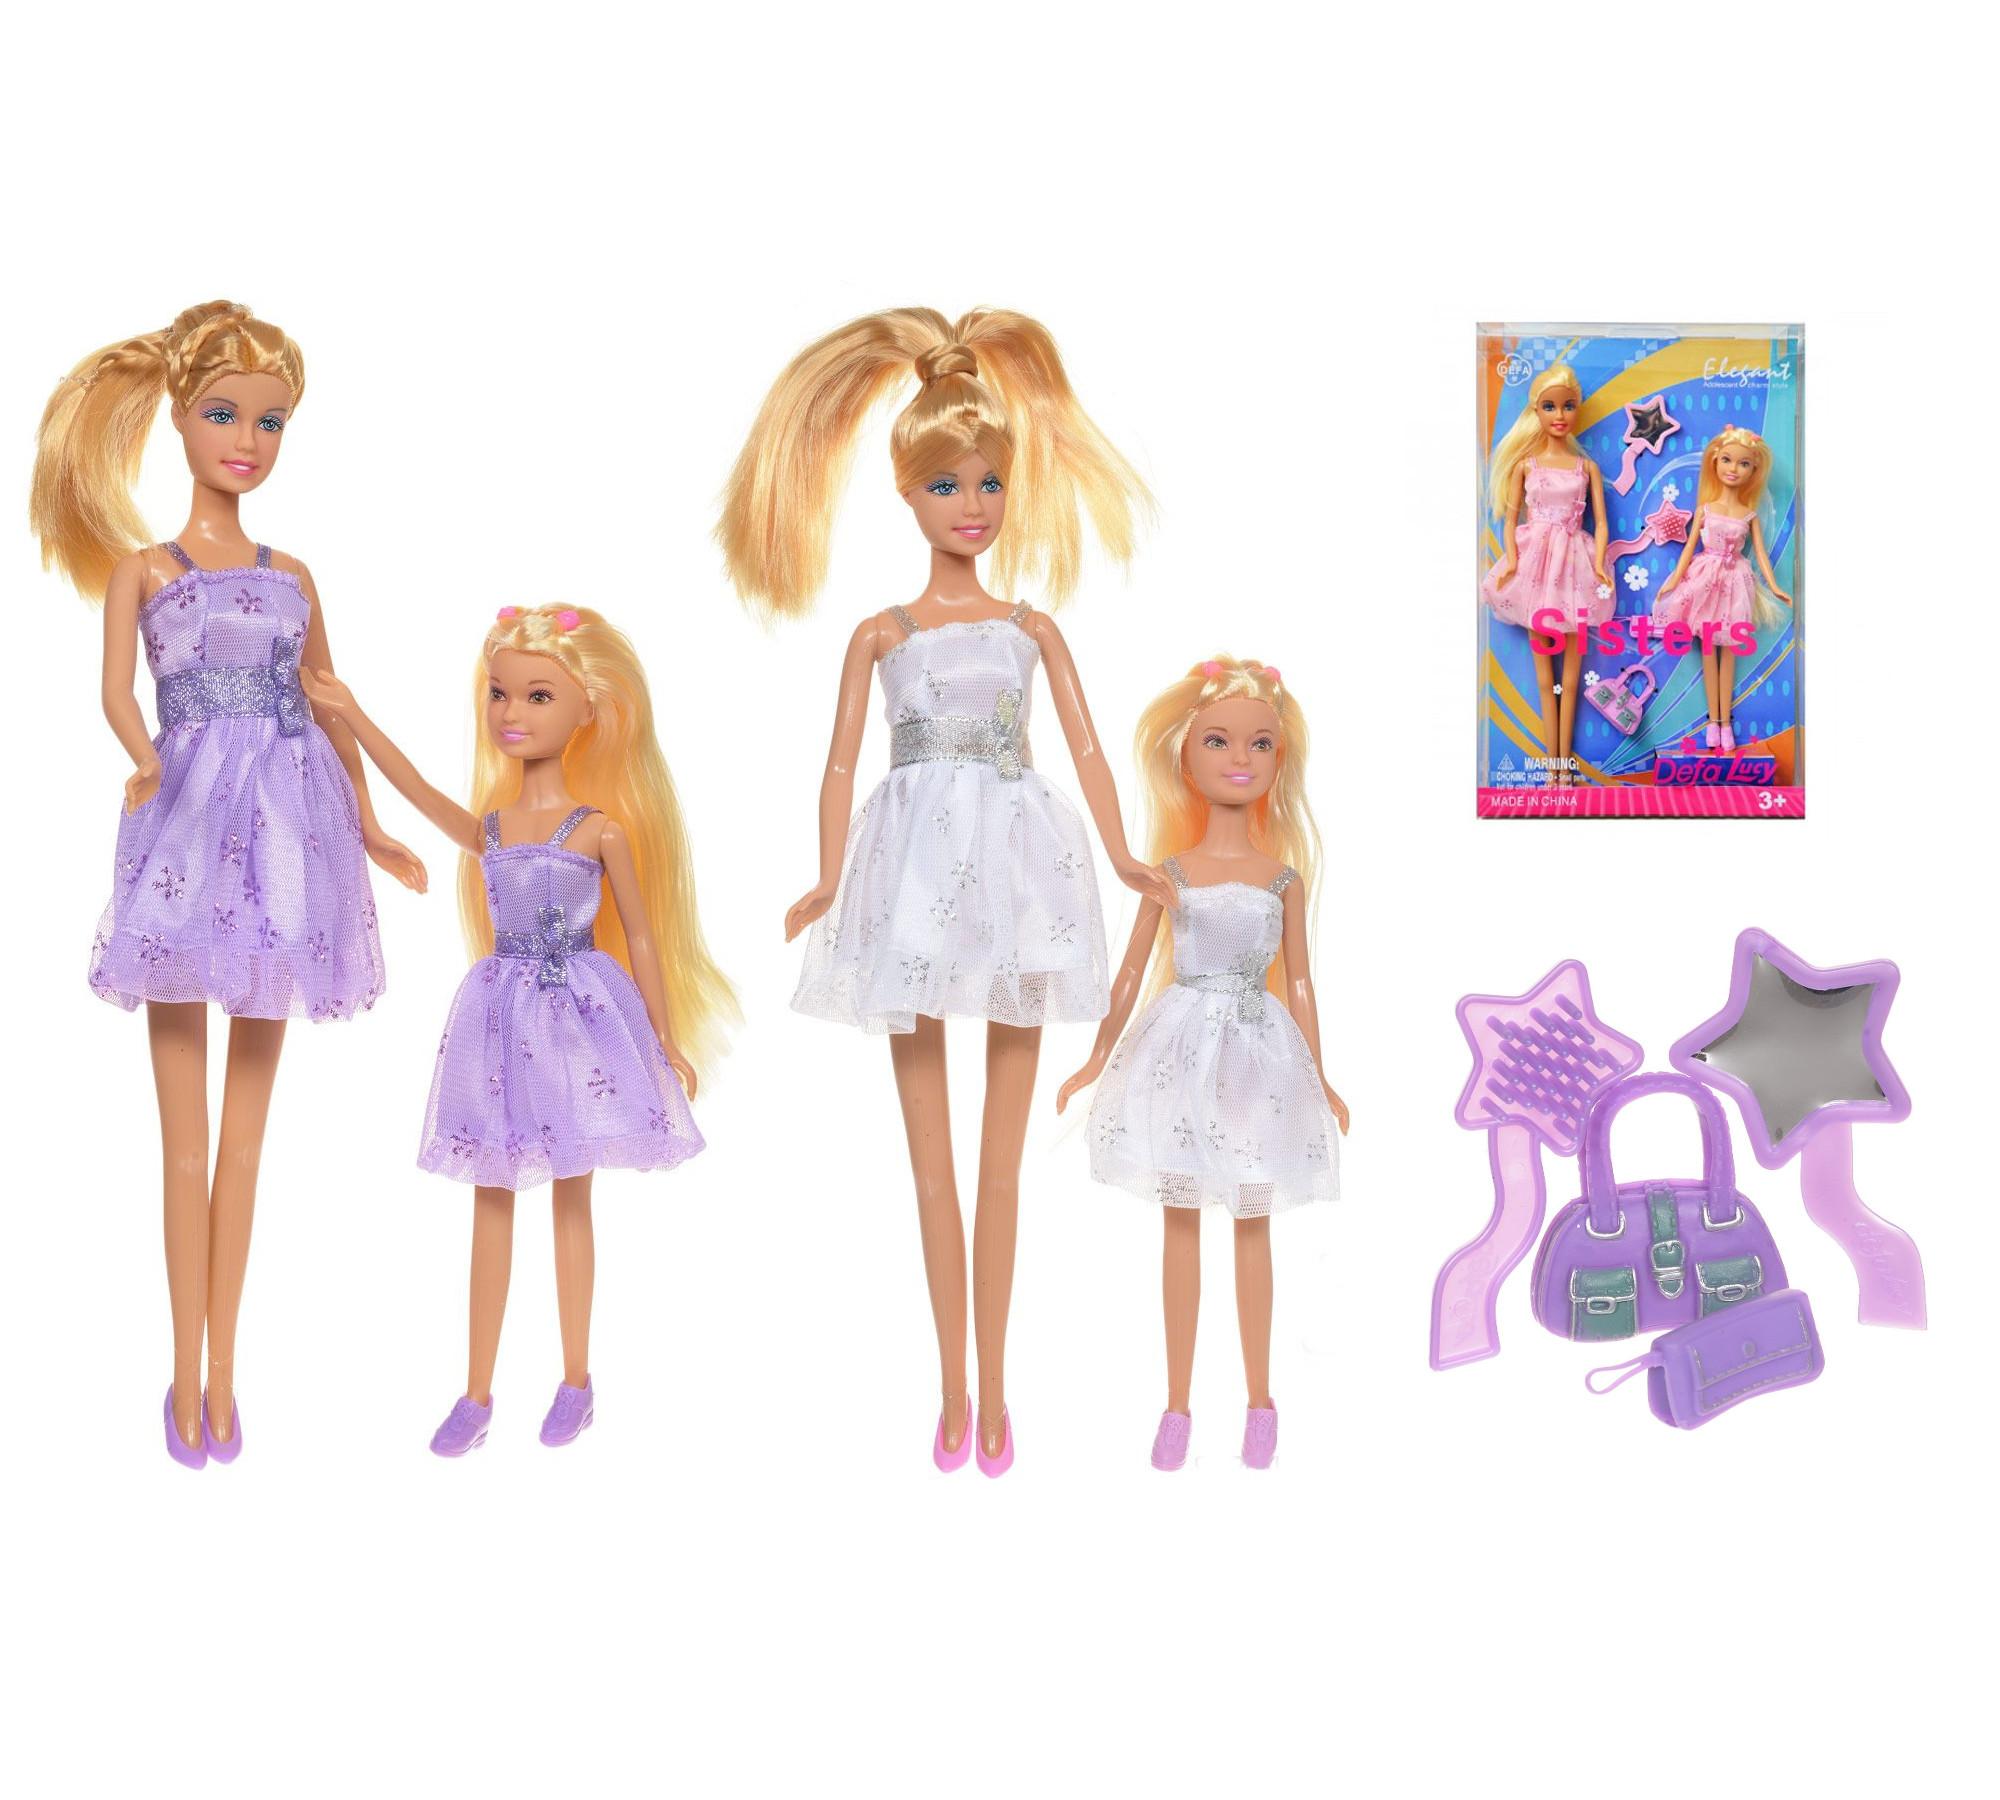 Набор из 2-х кукол - Сестрички, с аксессуарамиКуклы Defa Lucy<br>Набор из 2-х кукол - Сестрички, с аксессуарами<br>